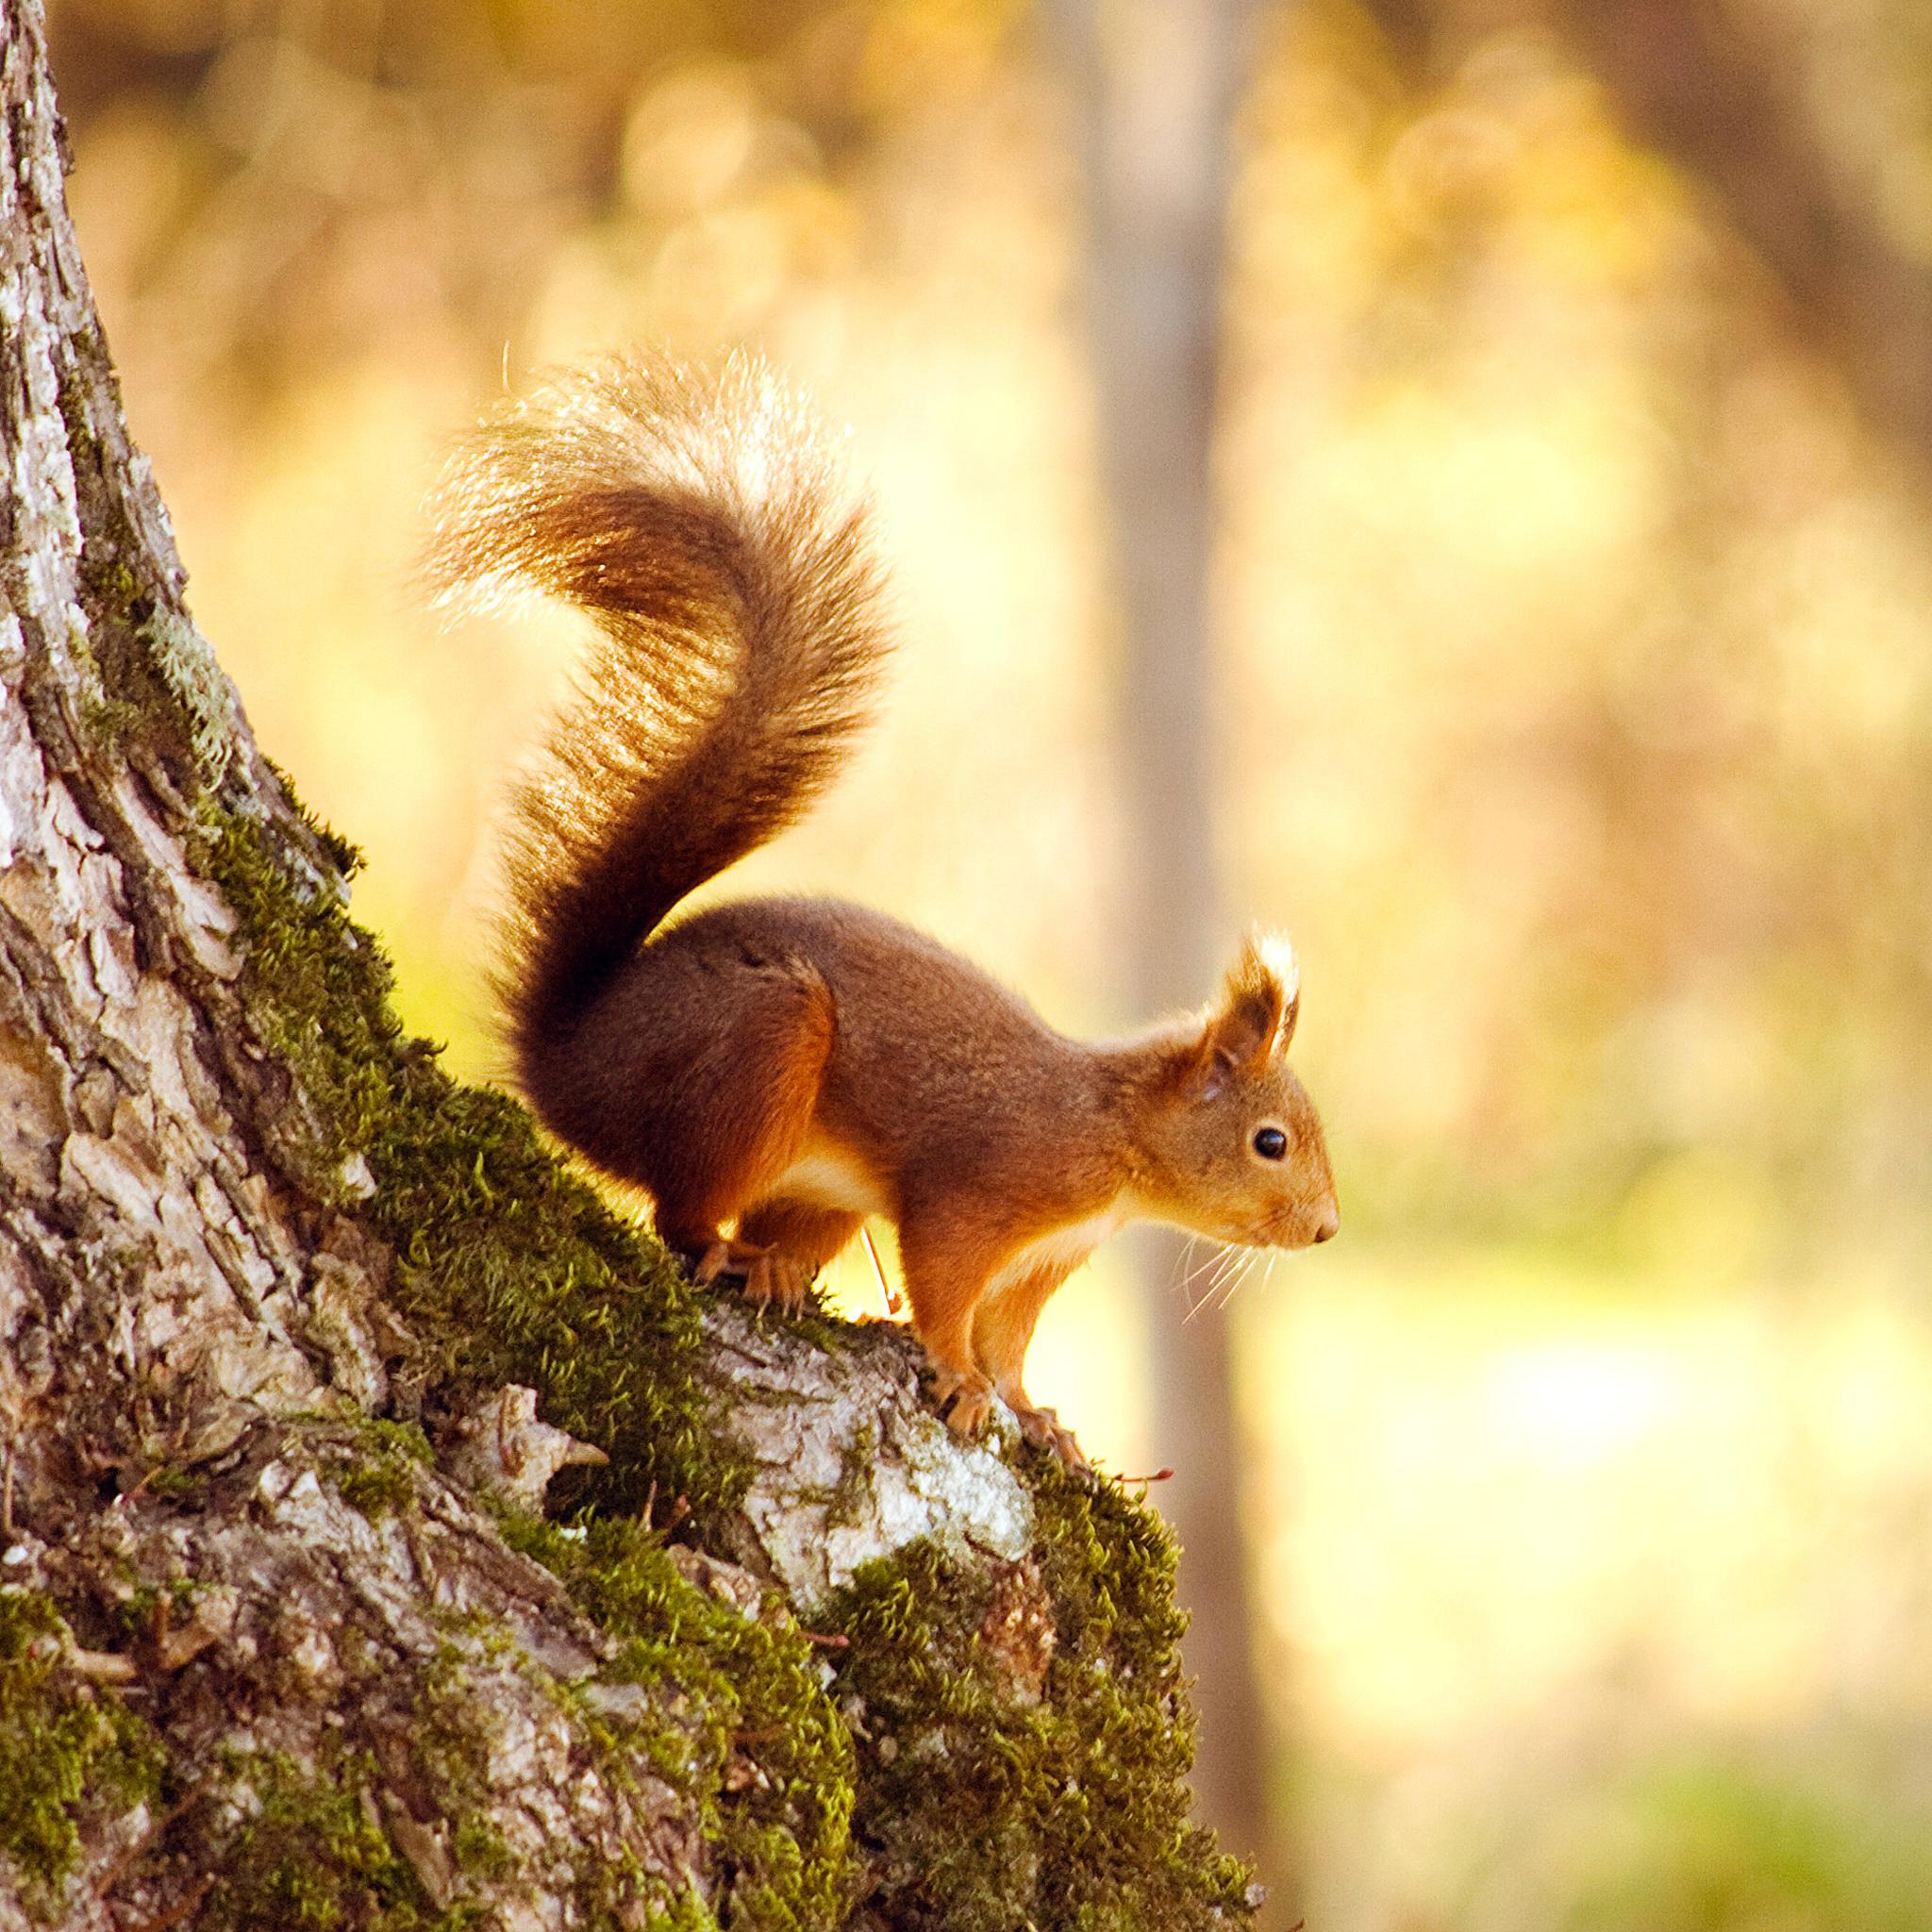 Squirrel-3Wallpapers-iPad-Retina